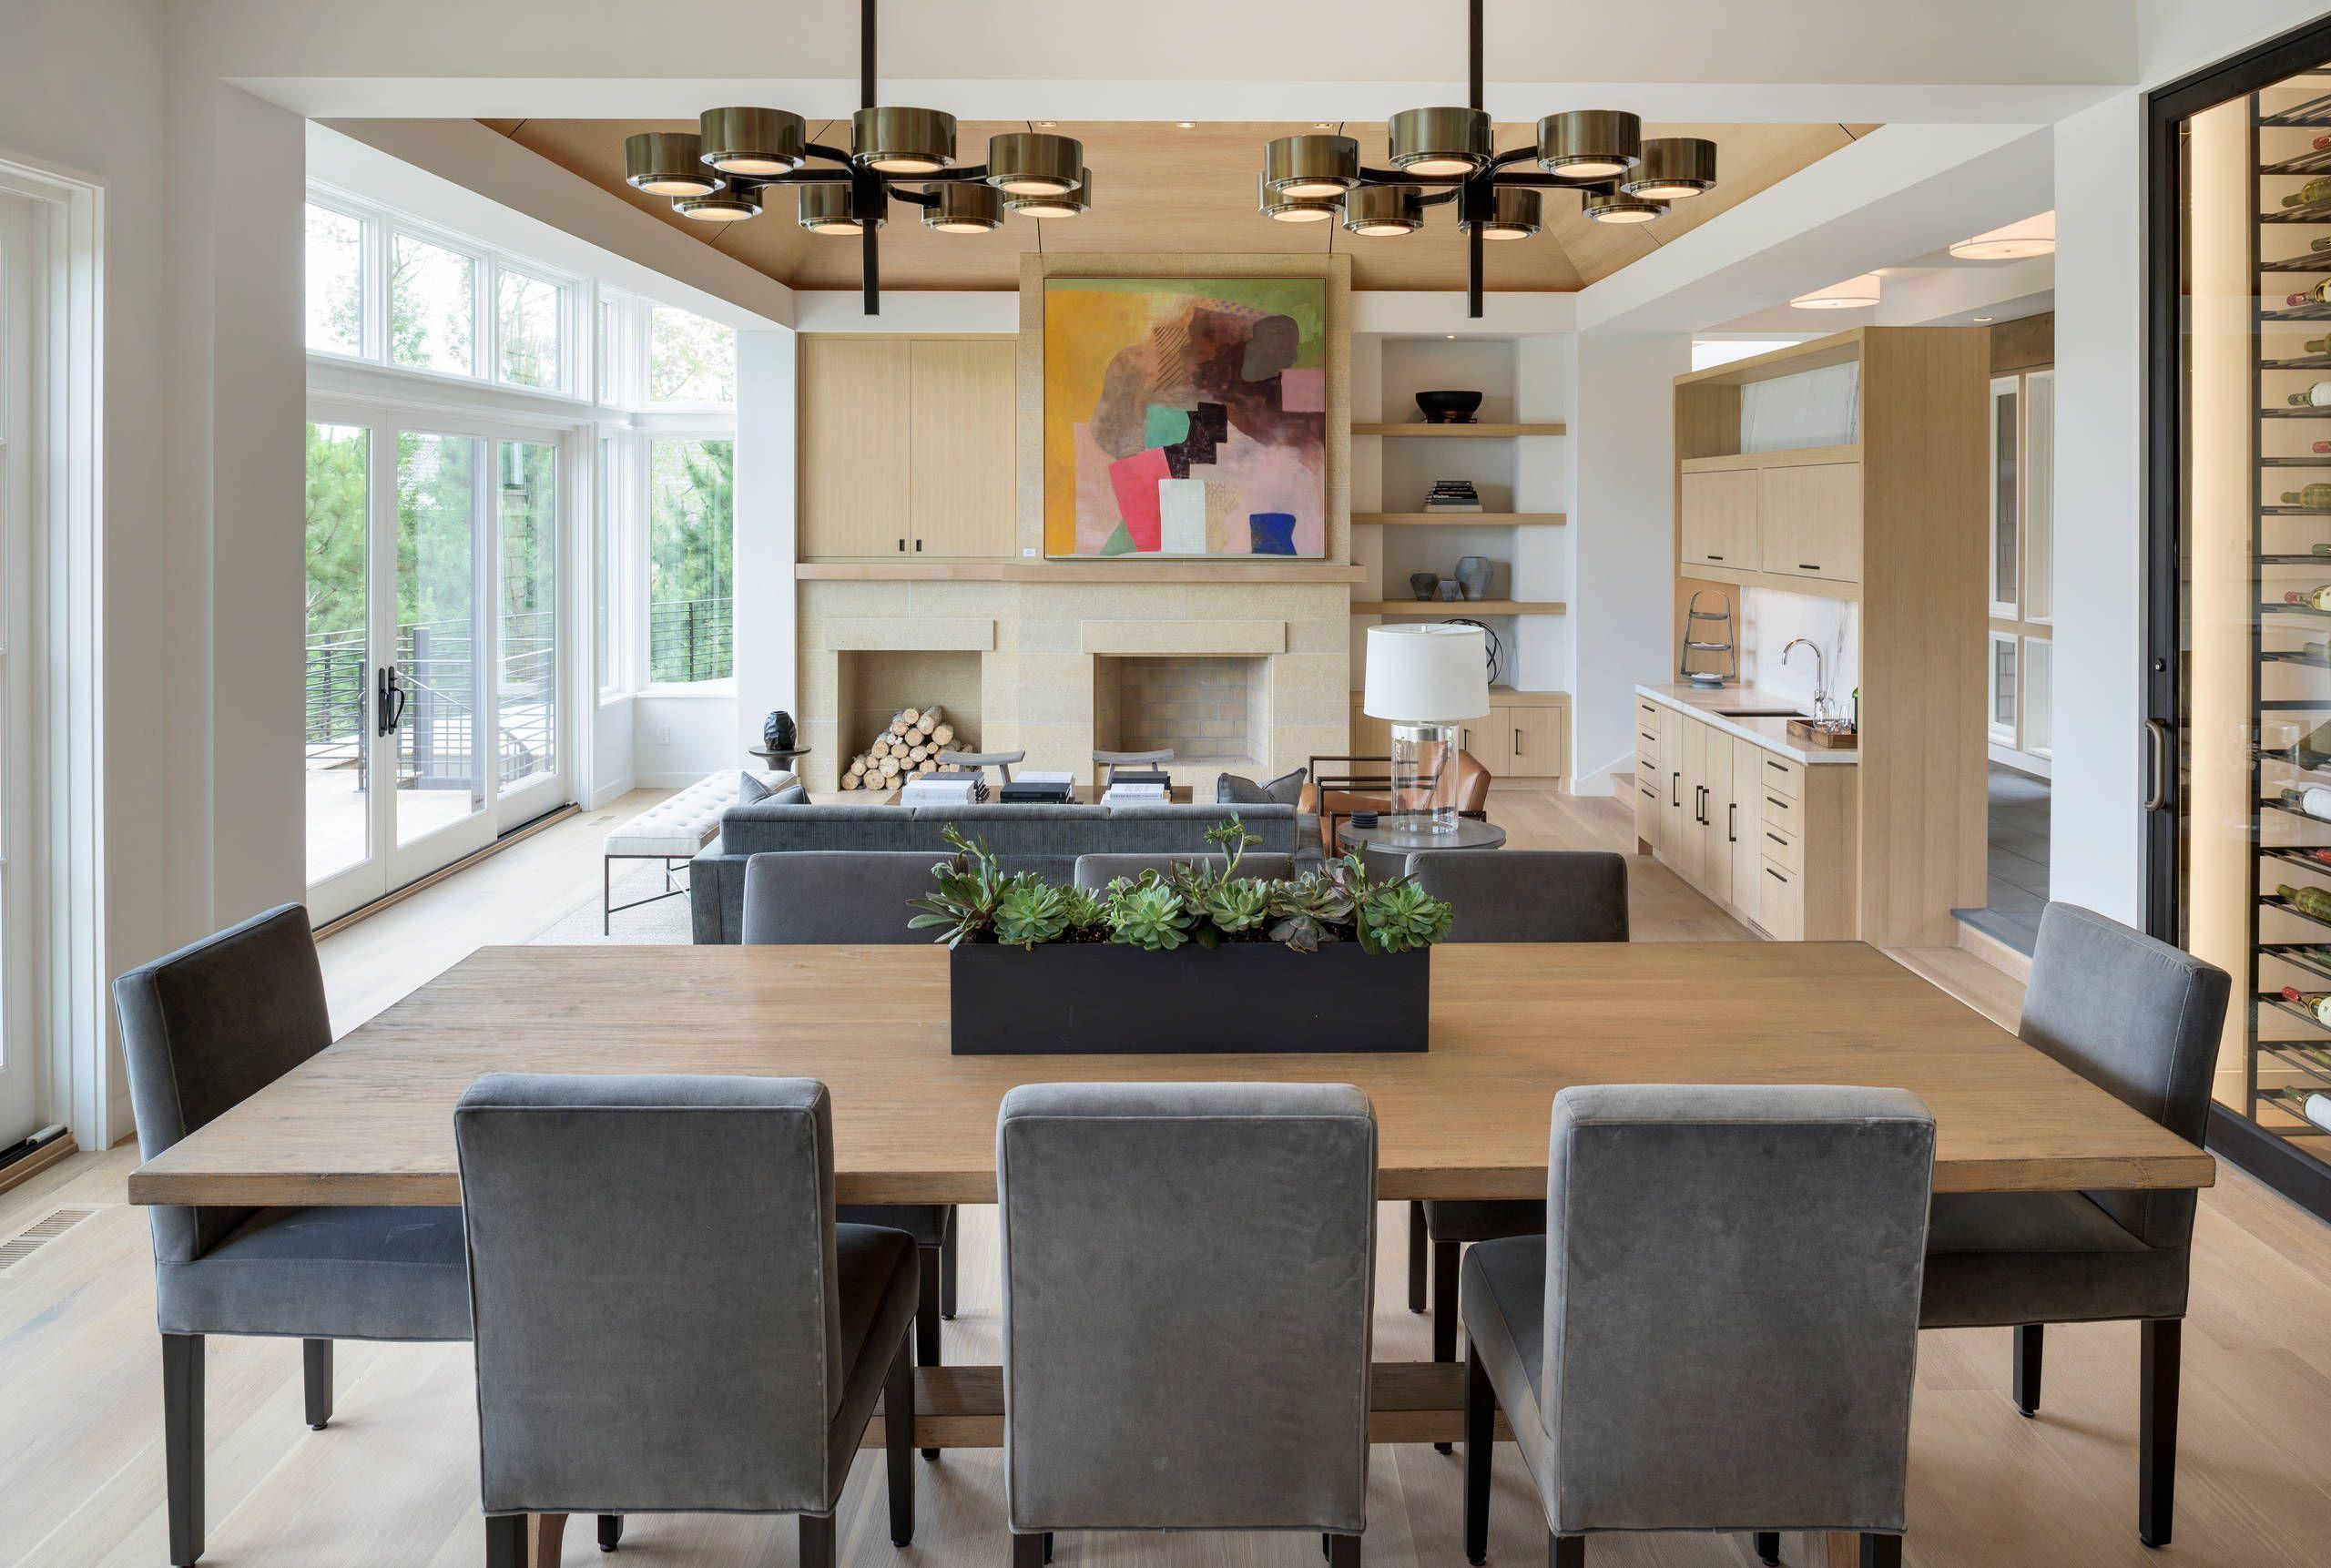 Casas modernas ideias dicas fachadas e projetos 80 fotos Pisos para exteriores de casas modernas